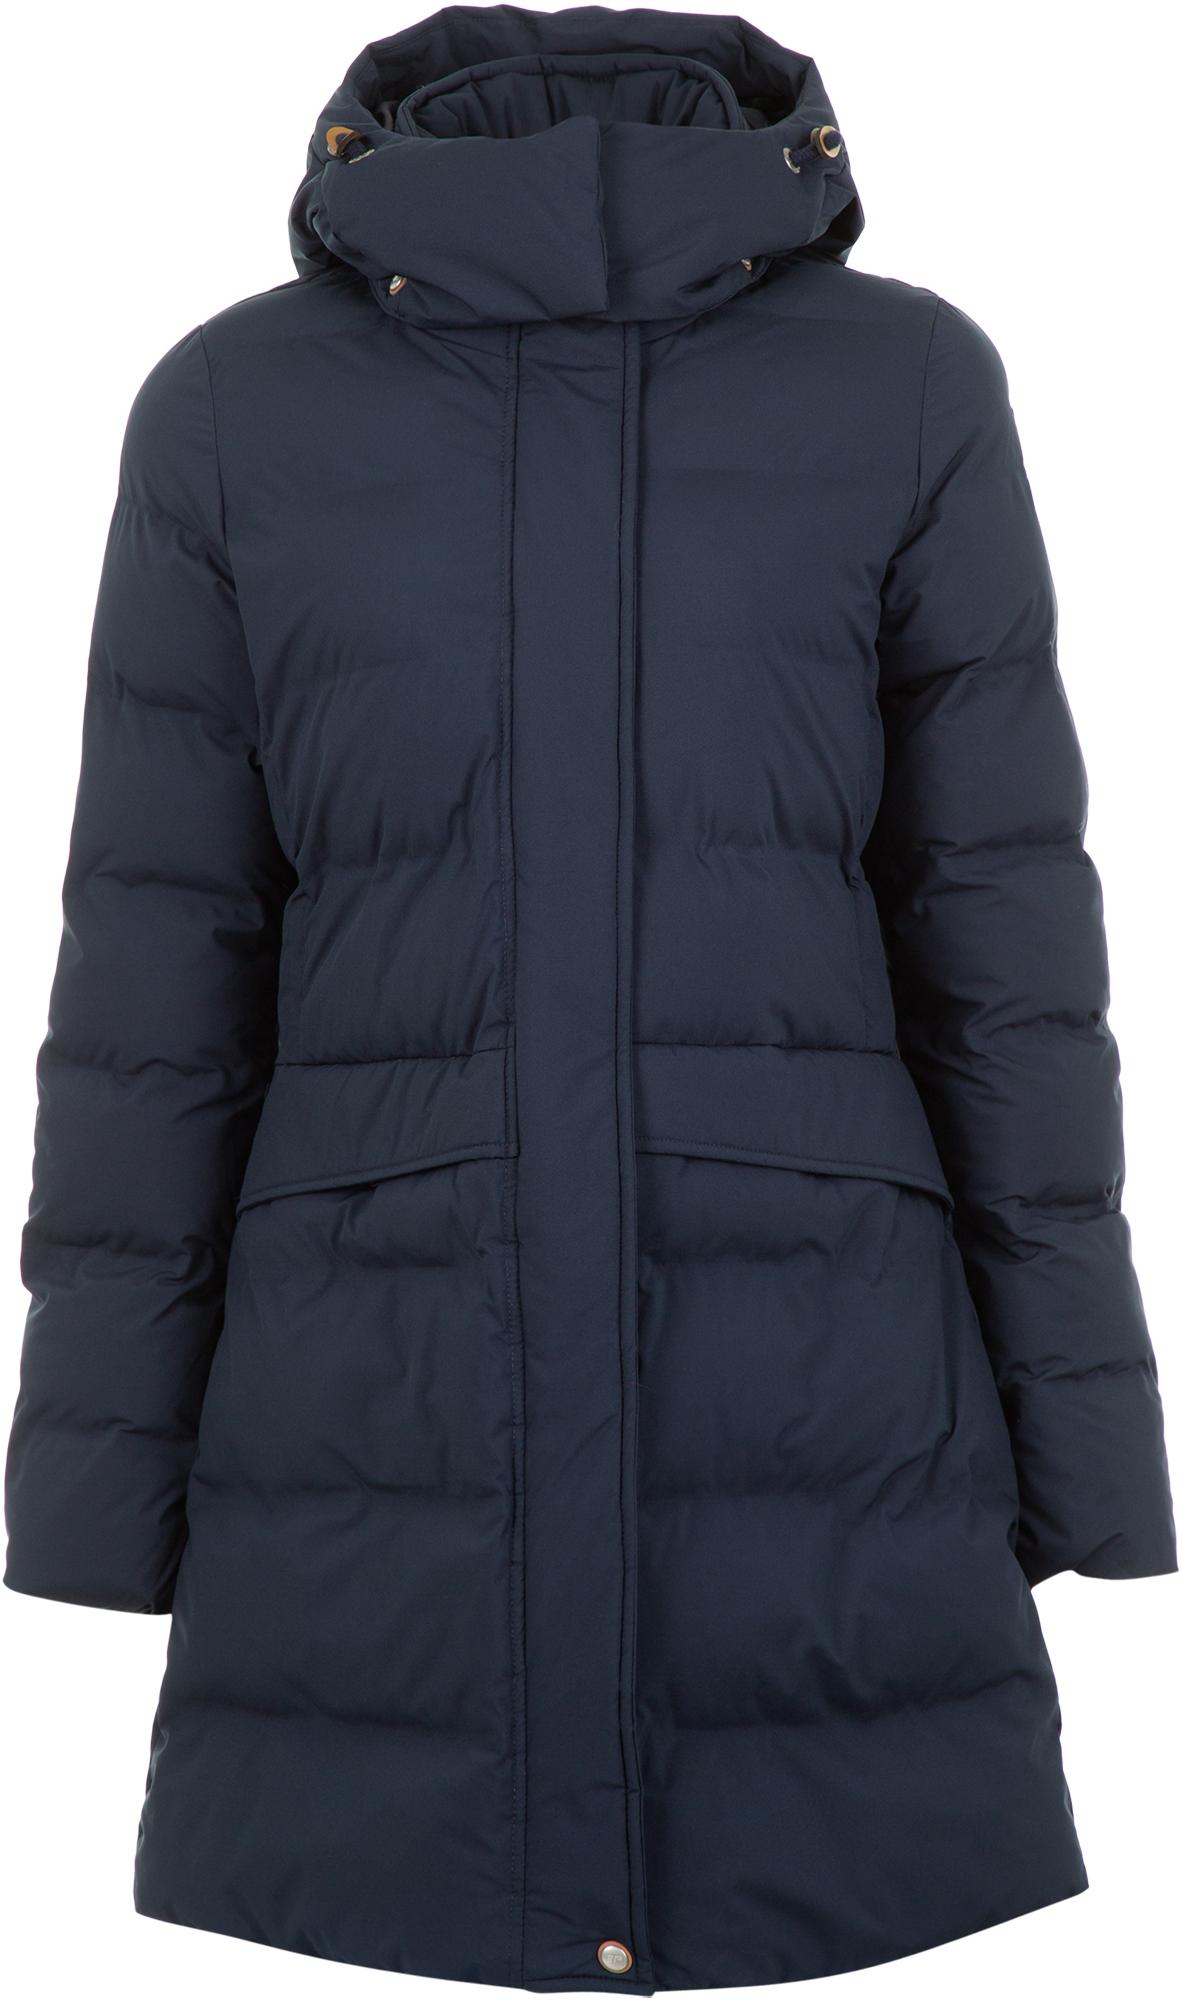 IcePeak Куртка утепленная женская IcePeak Anoka, размер 52 цены онлайн